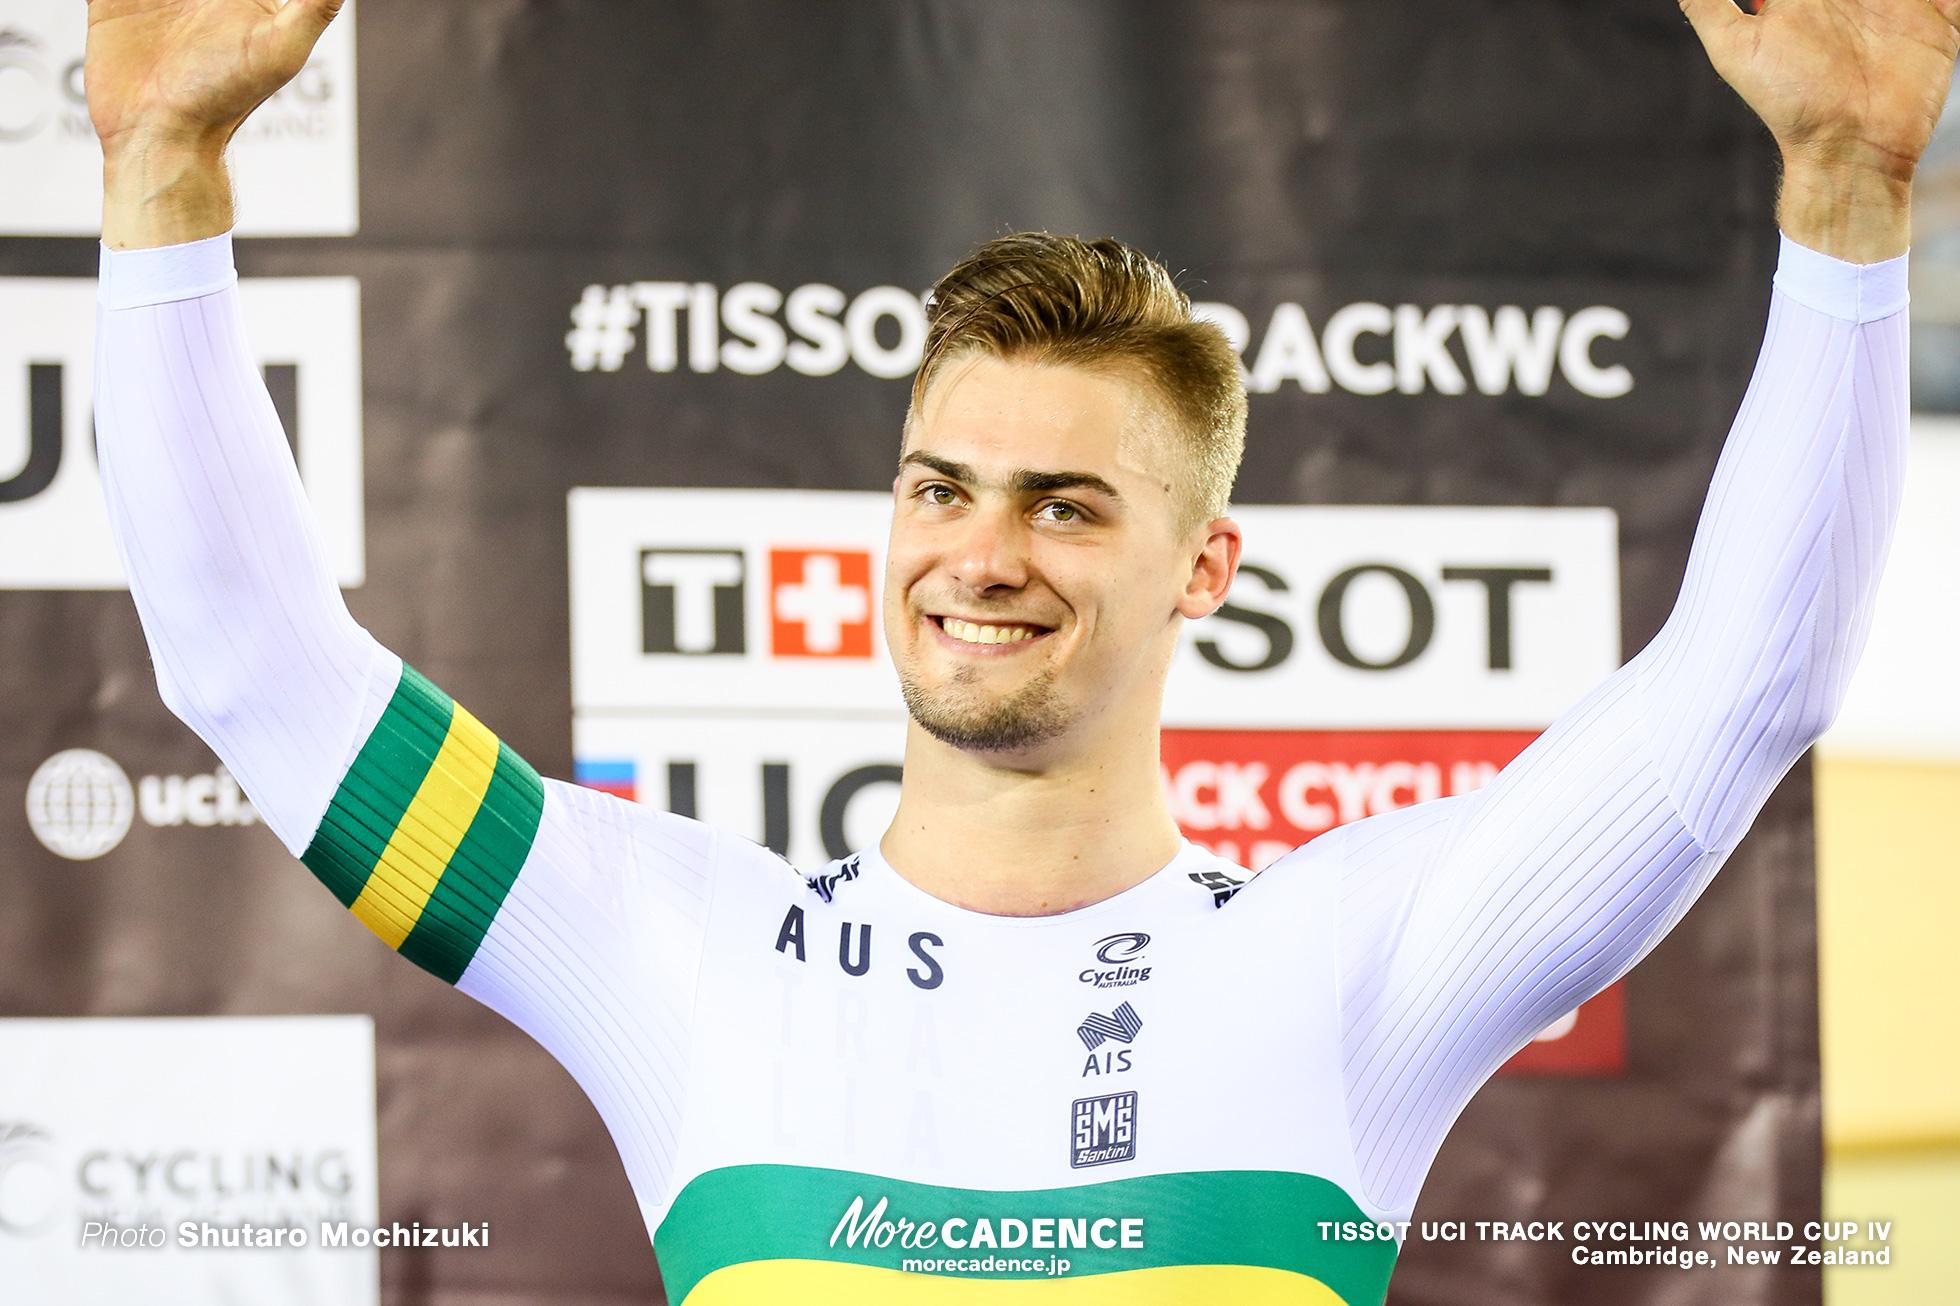 Final / Men's Keirin / TISSOT UCI TRACK CYCLING WORLD CUP IV, Cambridge, New Zealand, Matthew GLAETZER マシュー・グレーツァー